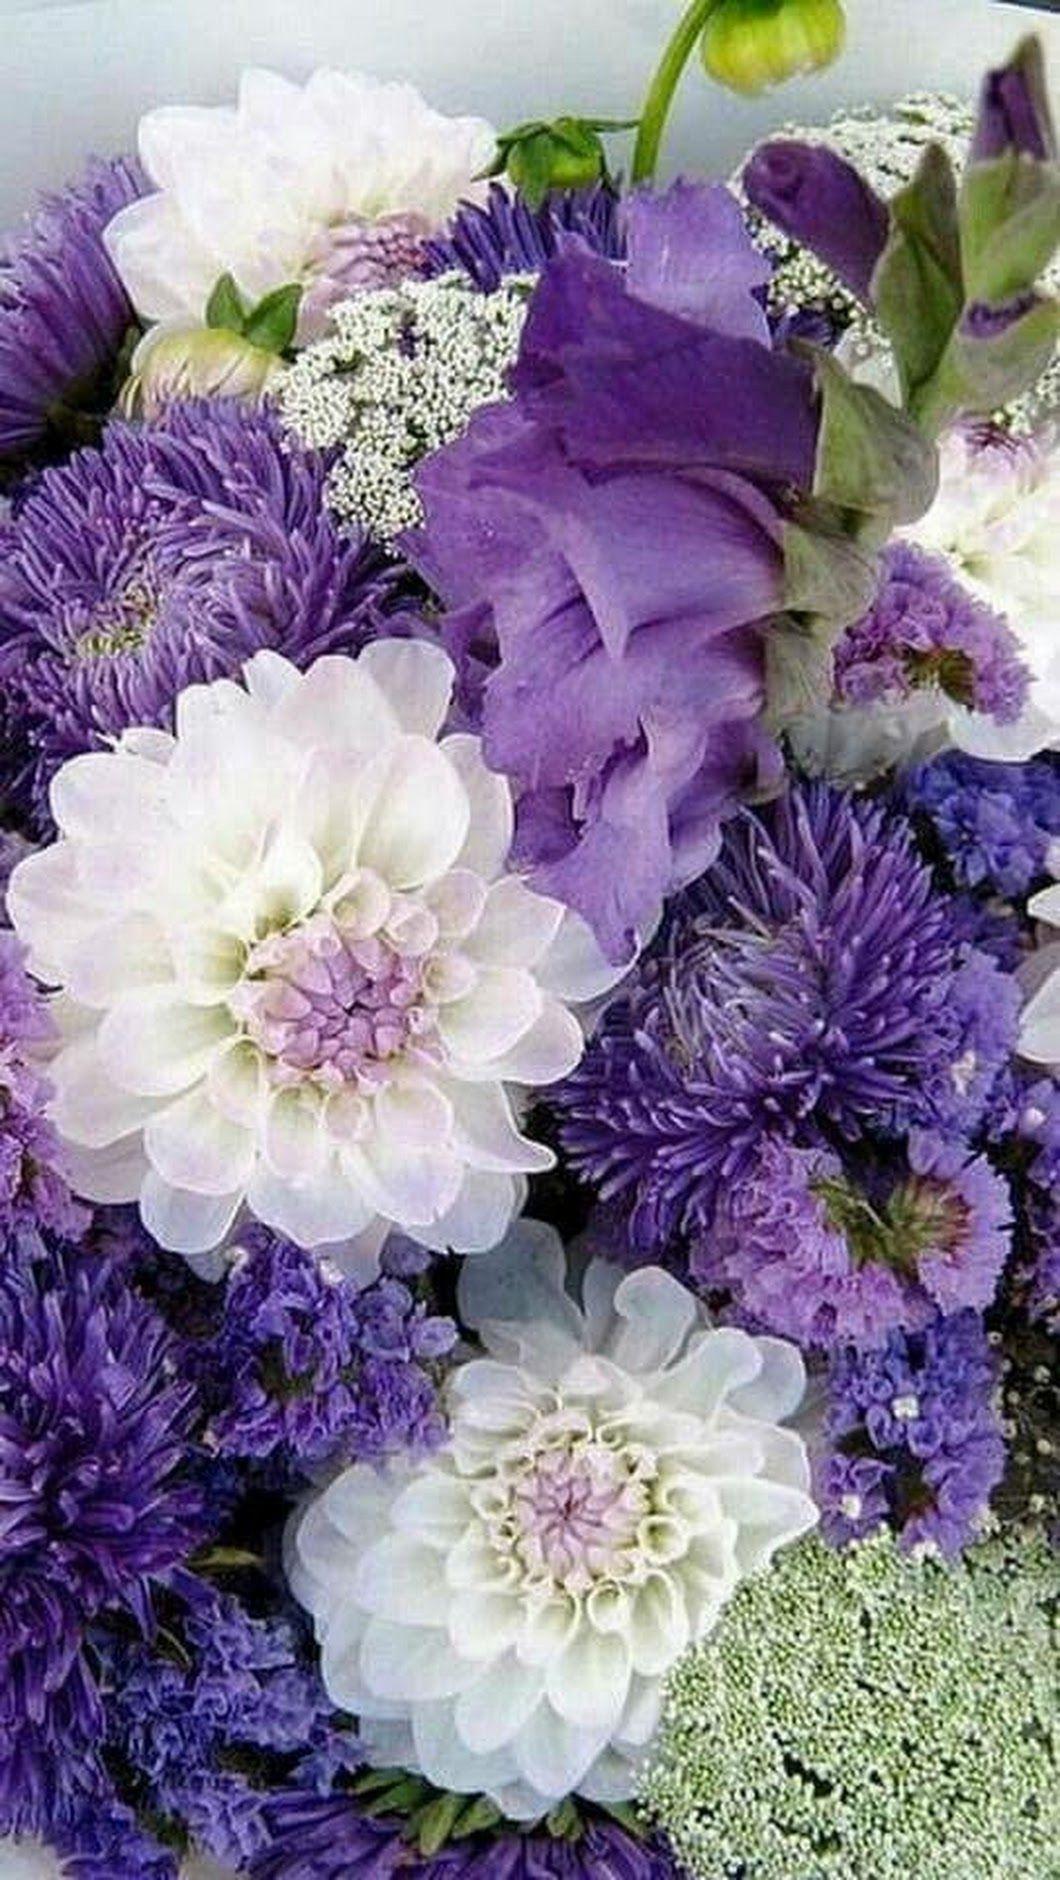 Beautiful flowers penny mowvley google plantas y flores